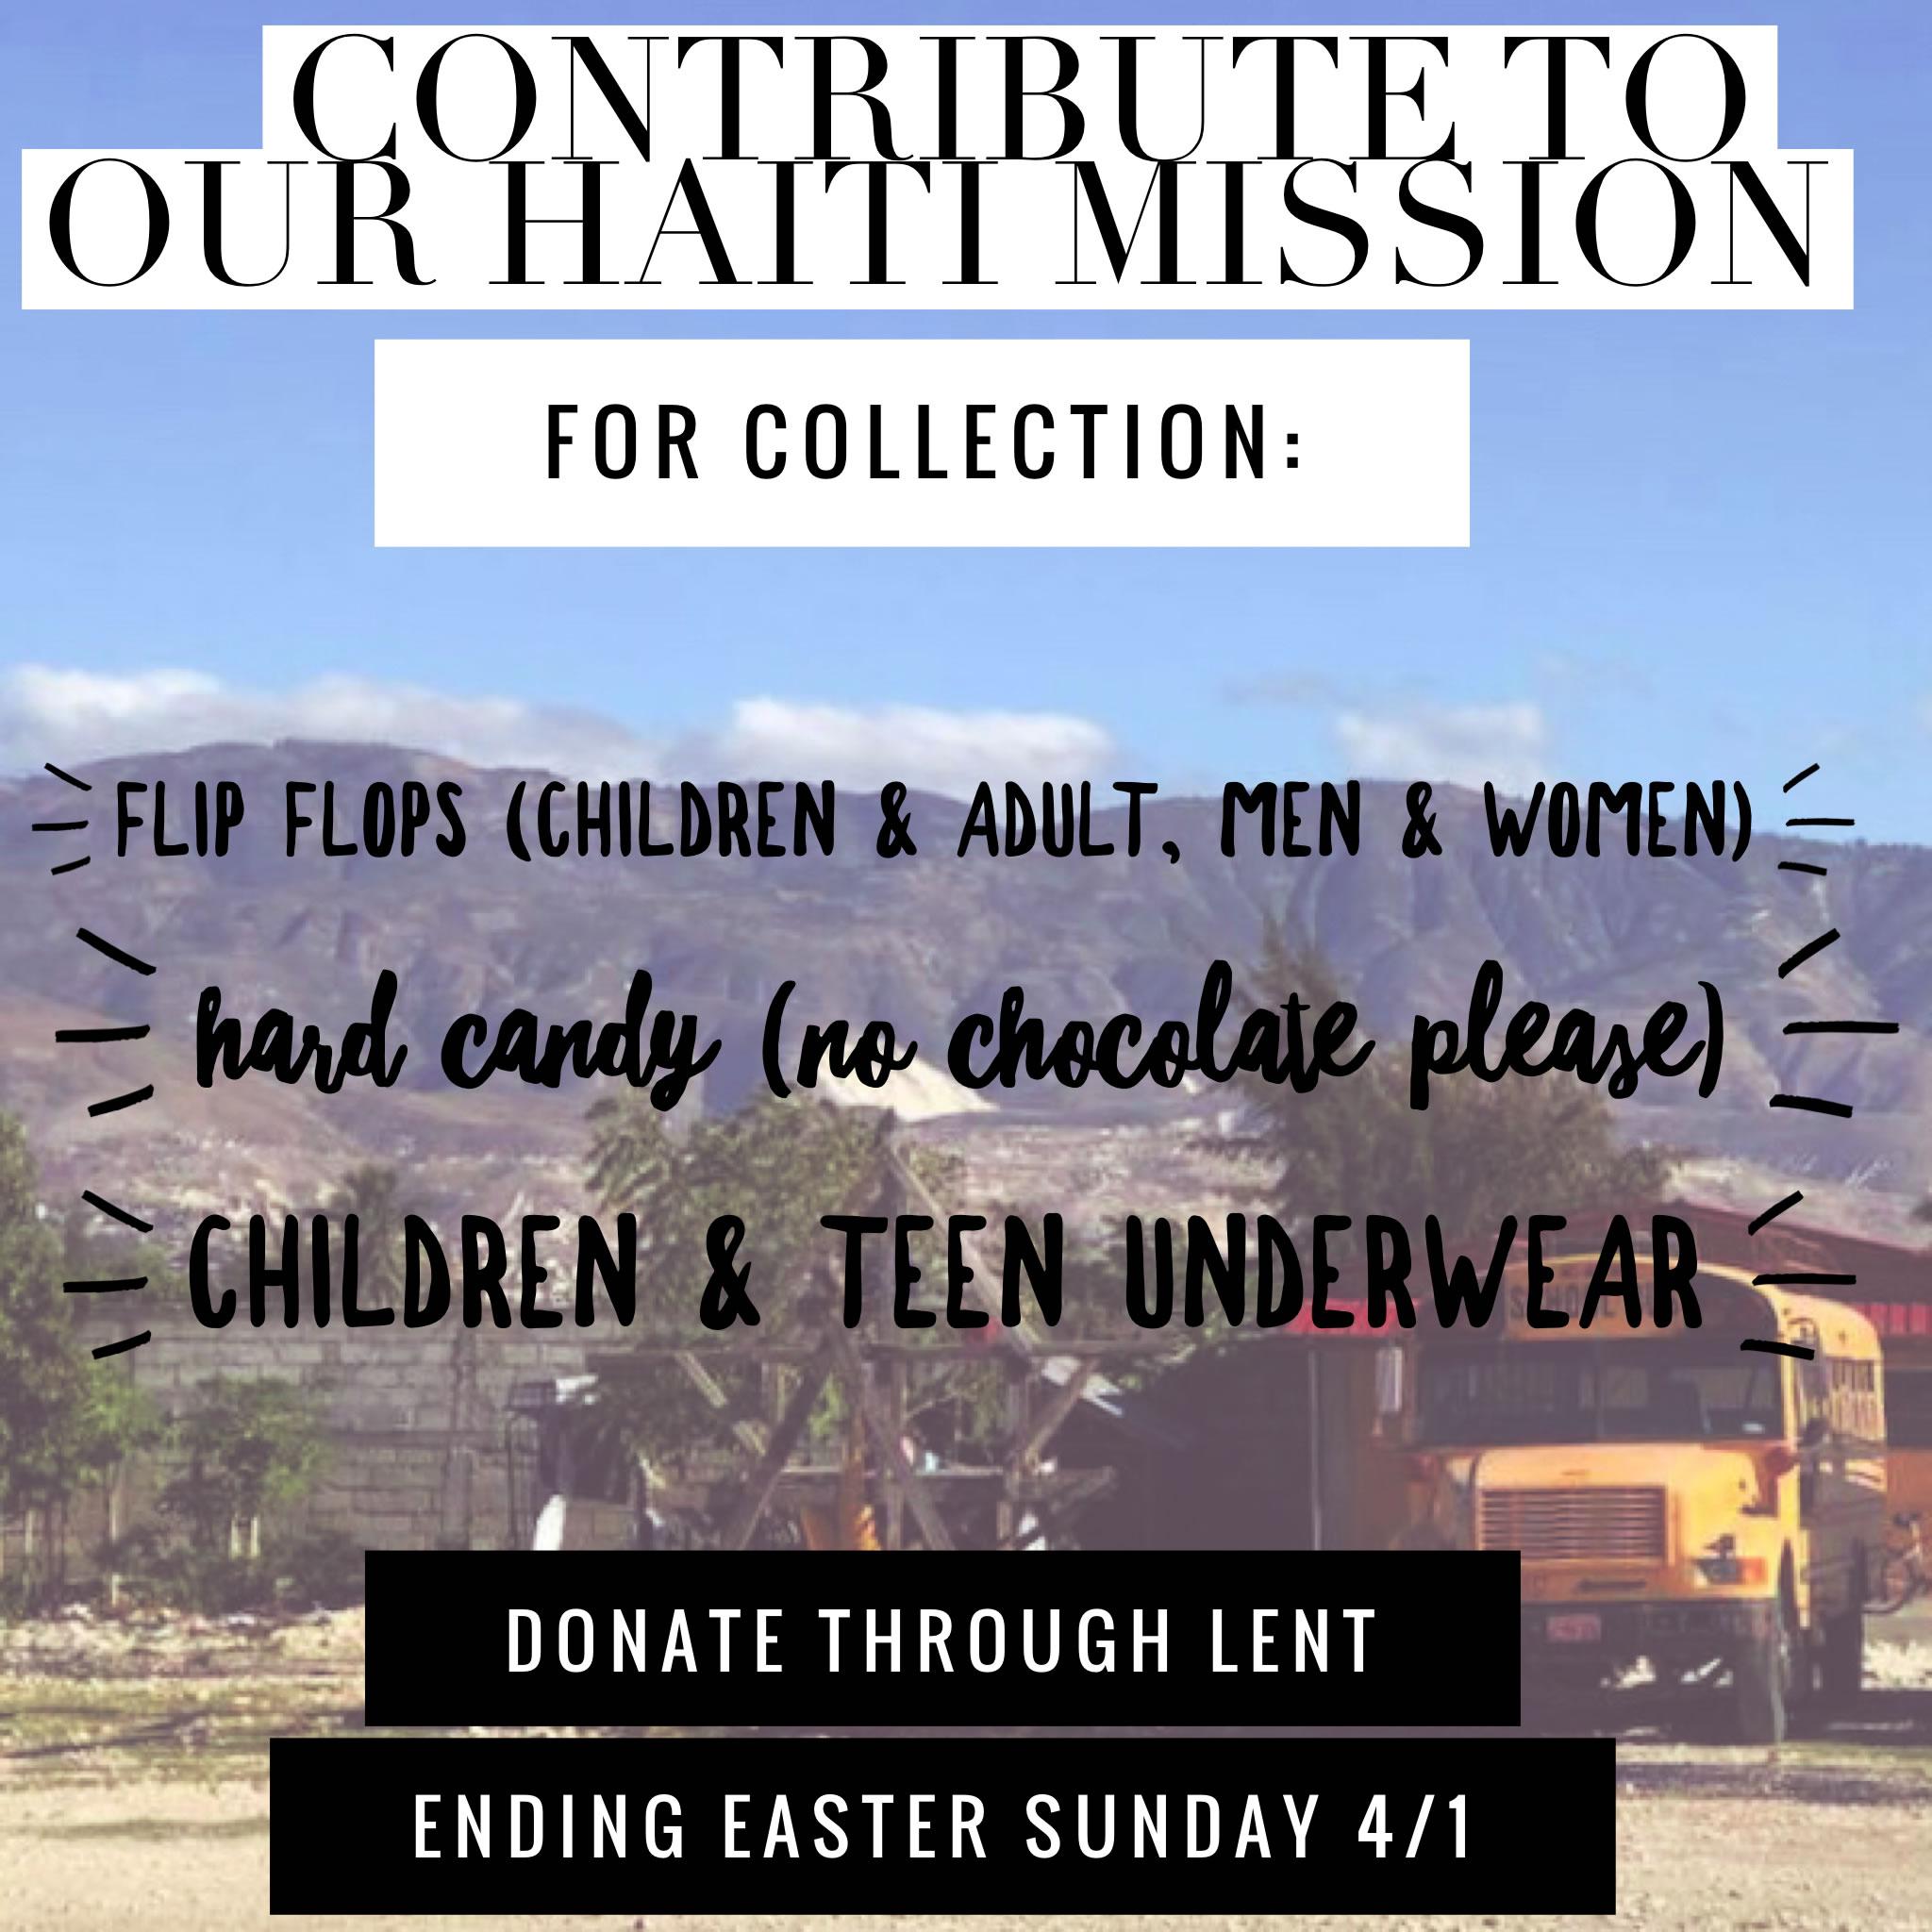 contribute-to-haiti-mission.jpg